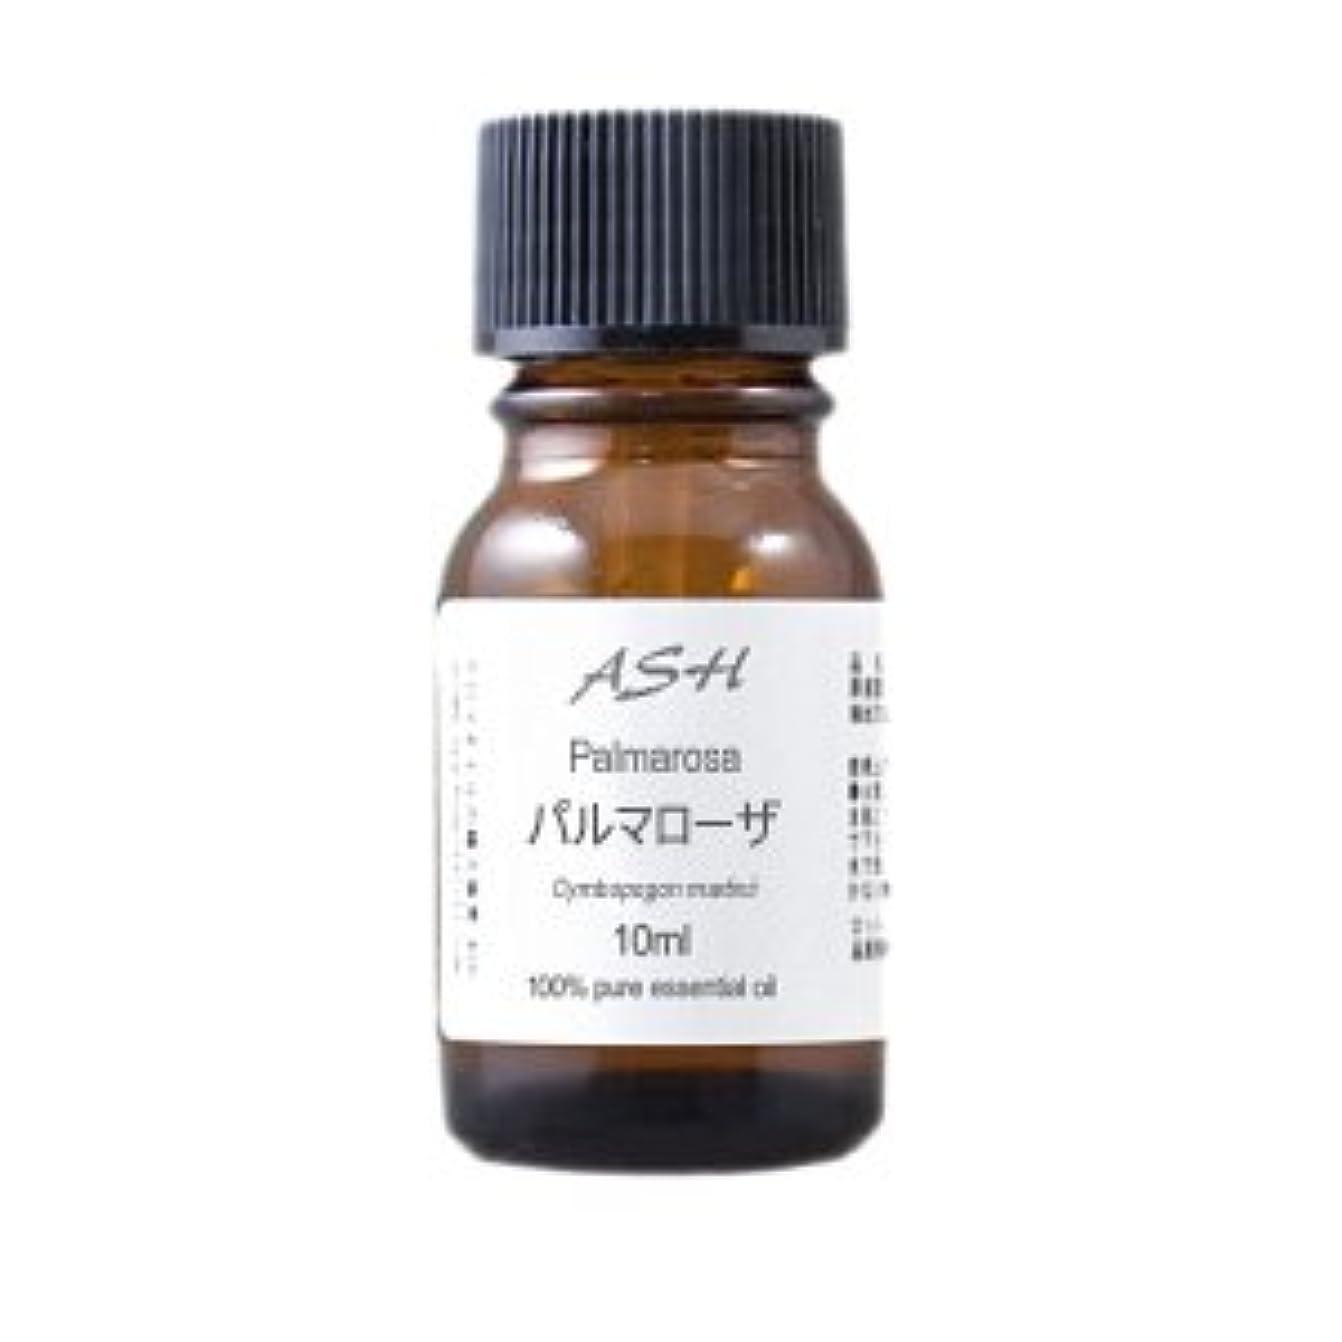 ASH パルマローザ エッセンシャルオイル 10ml AEAJ表示基準適合認定精油